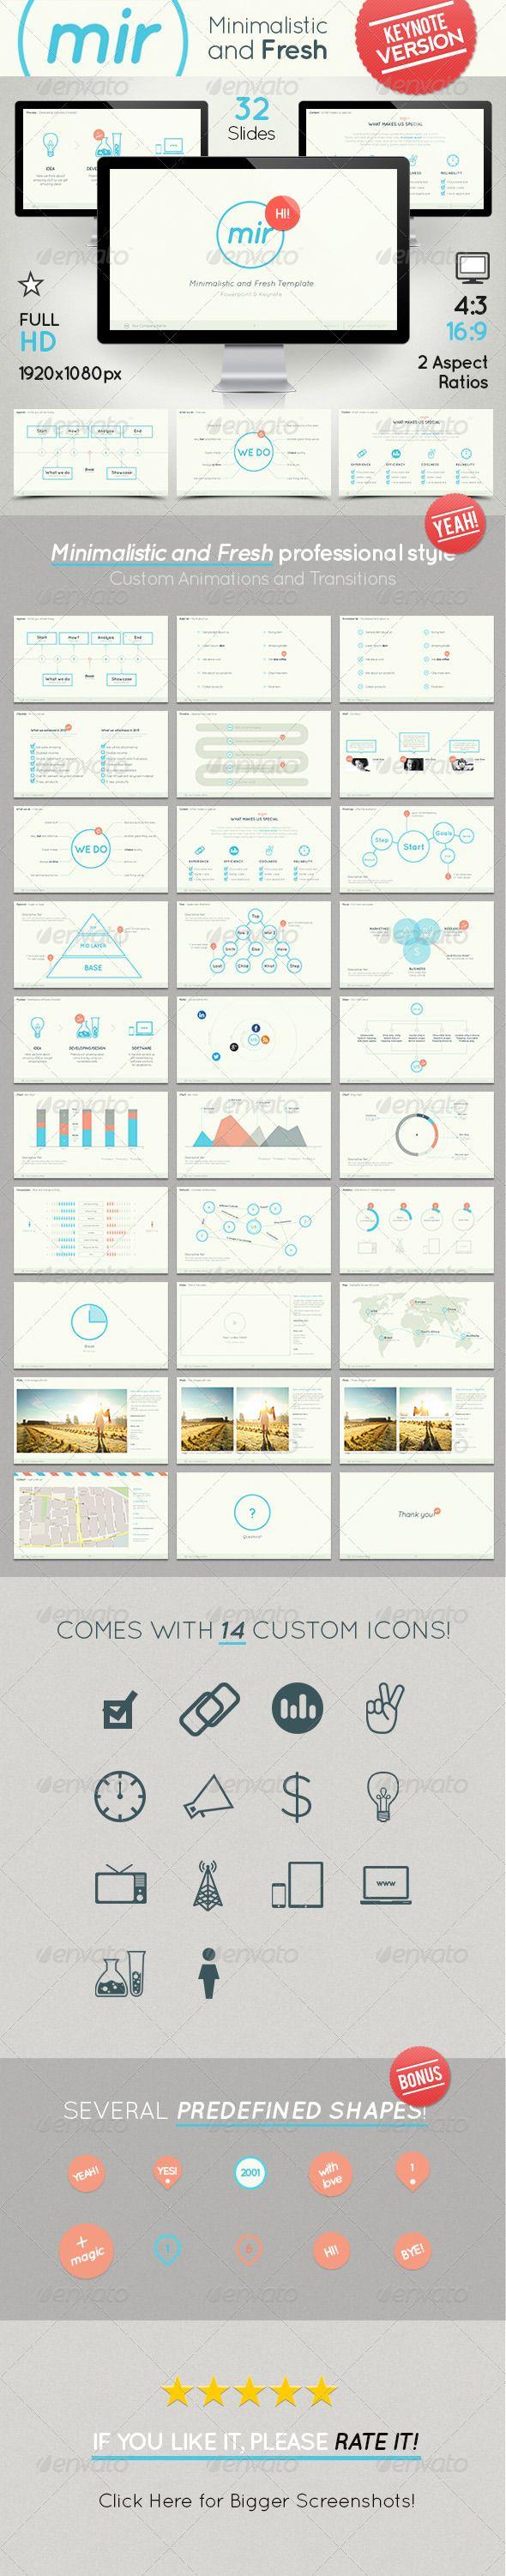 Mir- Minimalistic and Fresh Keynote Template | Keynote theme / template